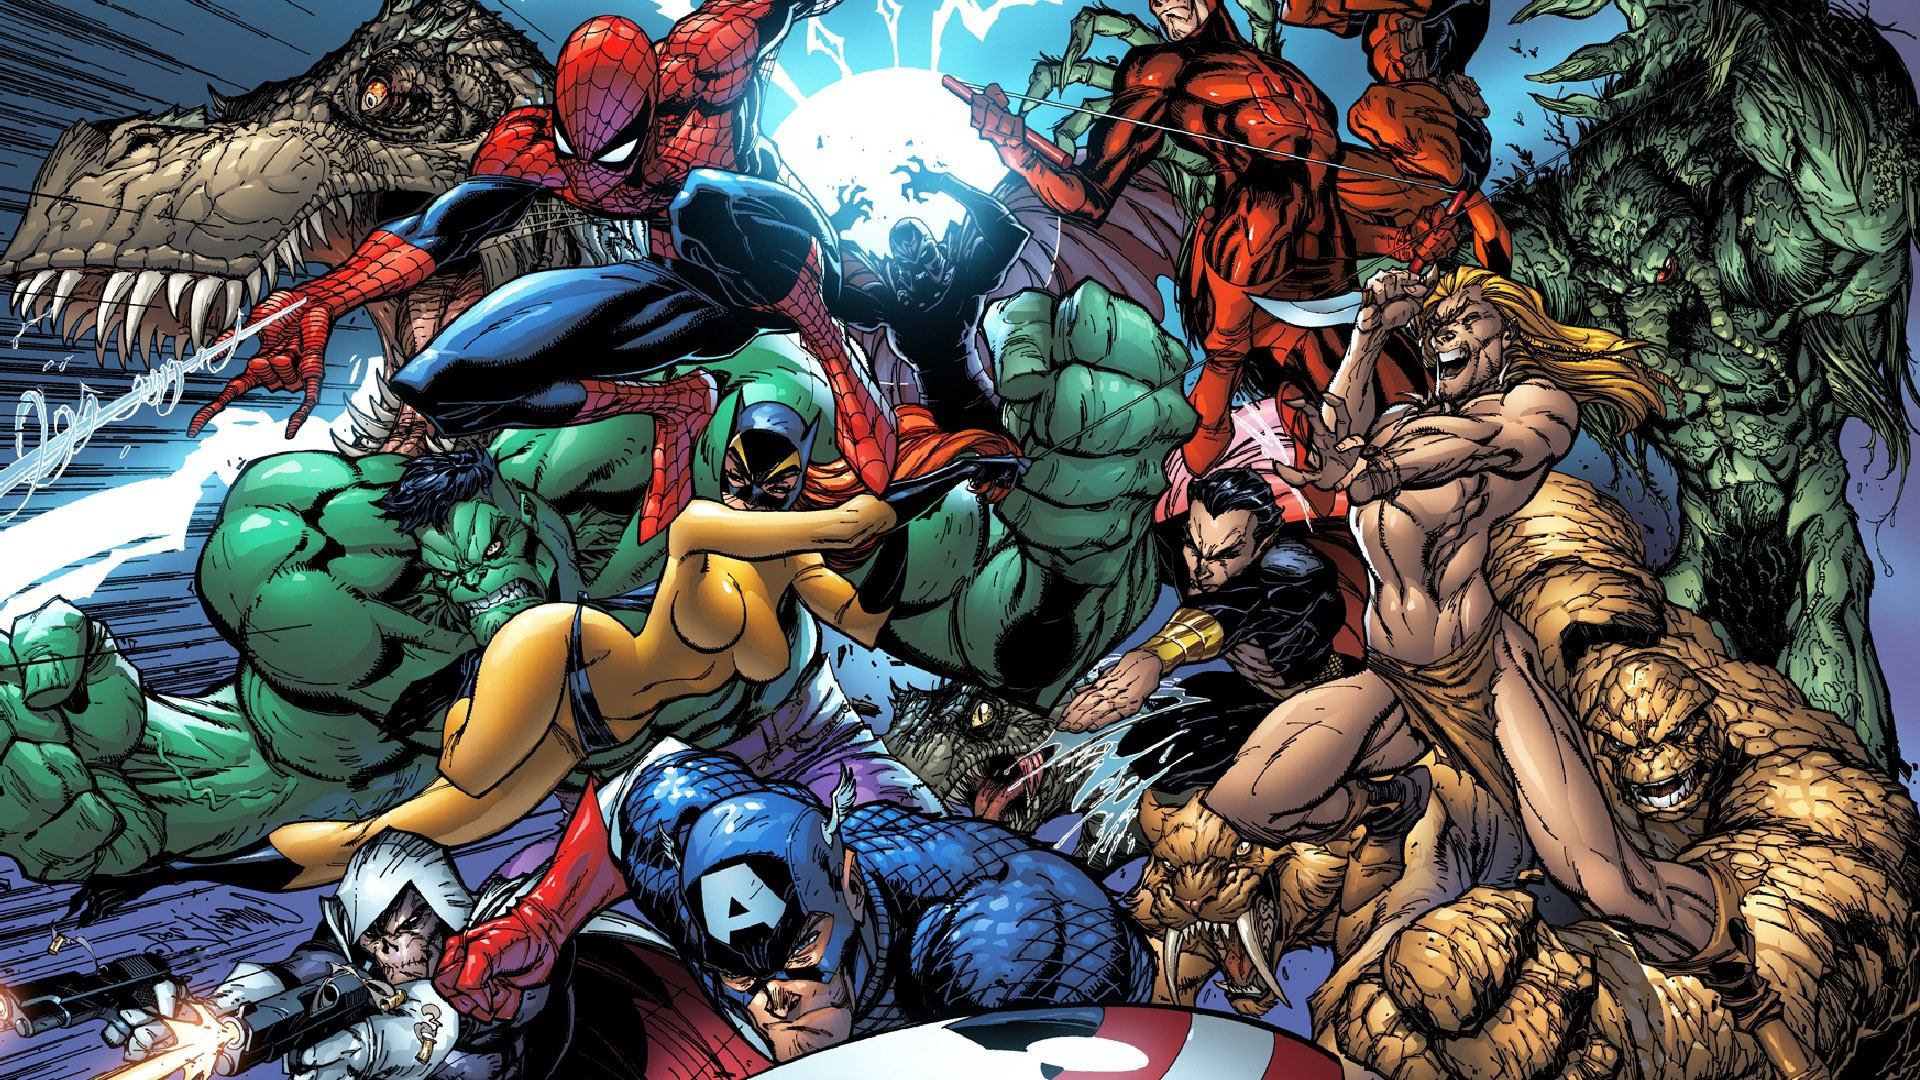 Marvel superheroes wallpaper 4879 1920x1080